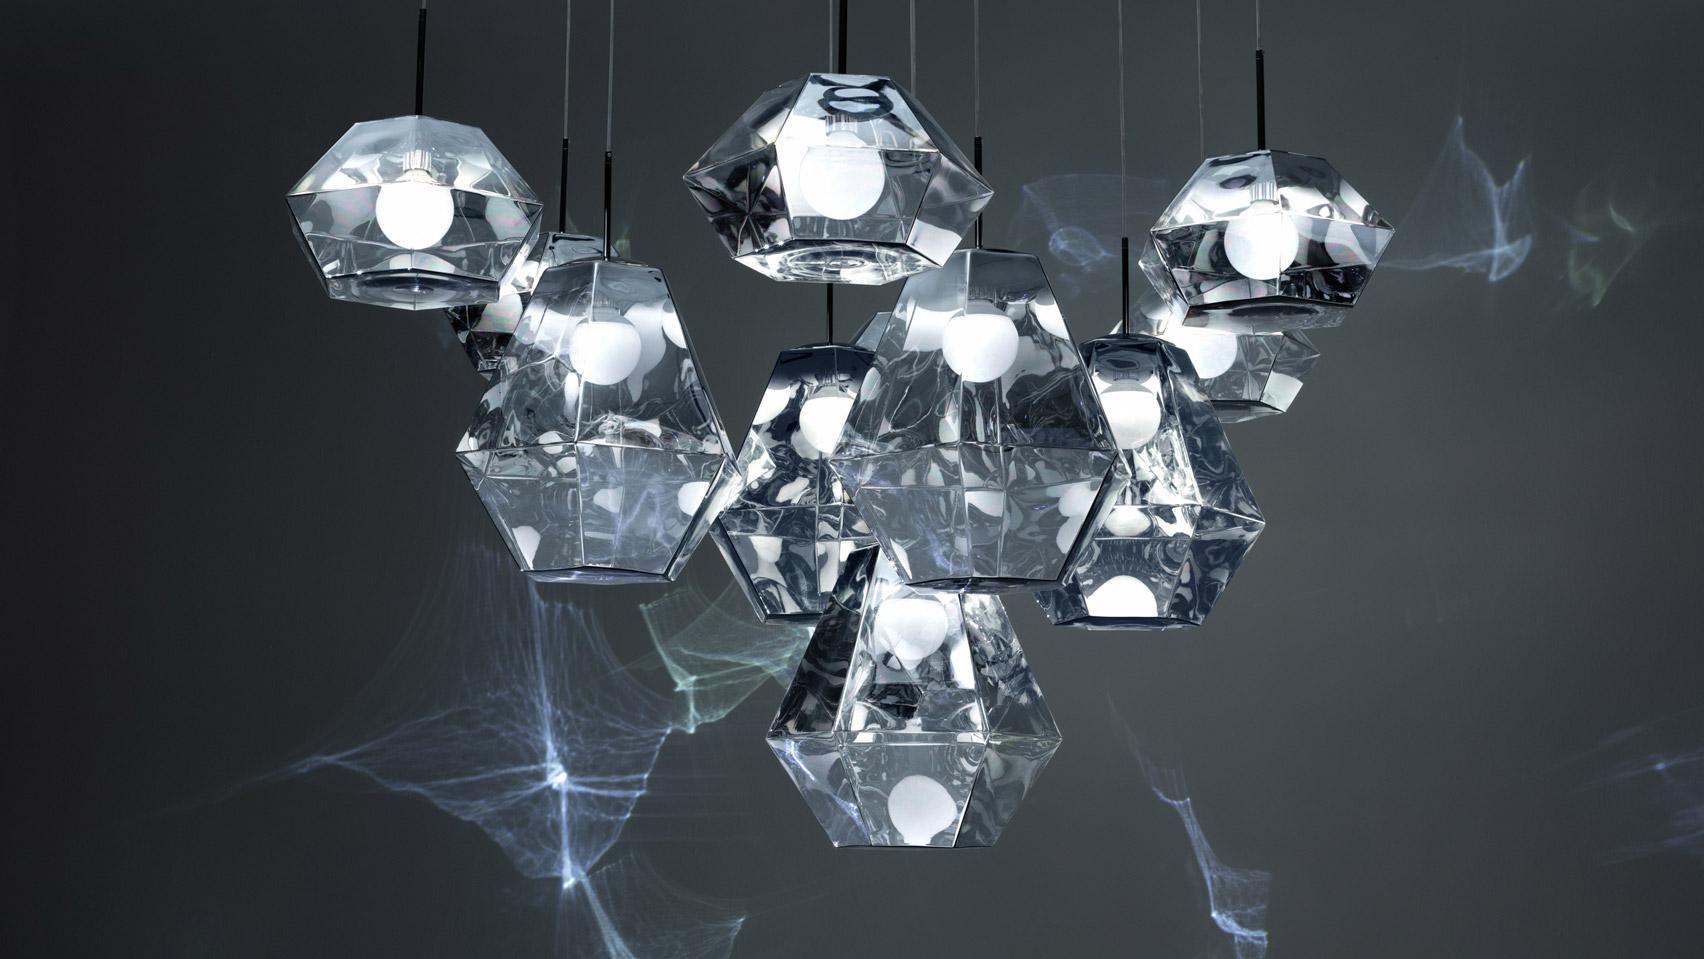 cut-tube-lighting-tom-dixon-lighting-design-lamps-milan-design-week-2017_dezeen_hero.jpg